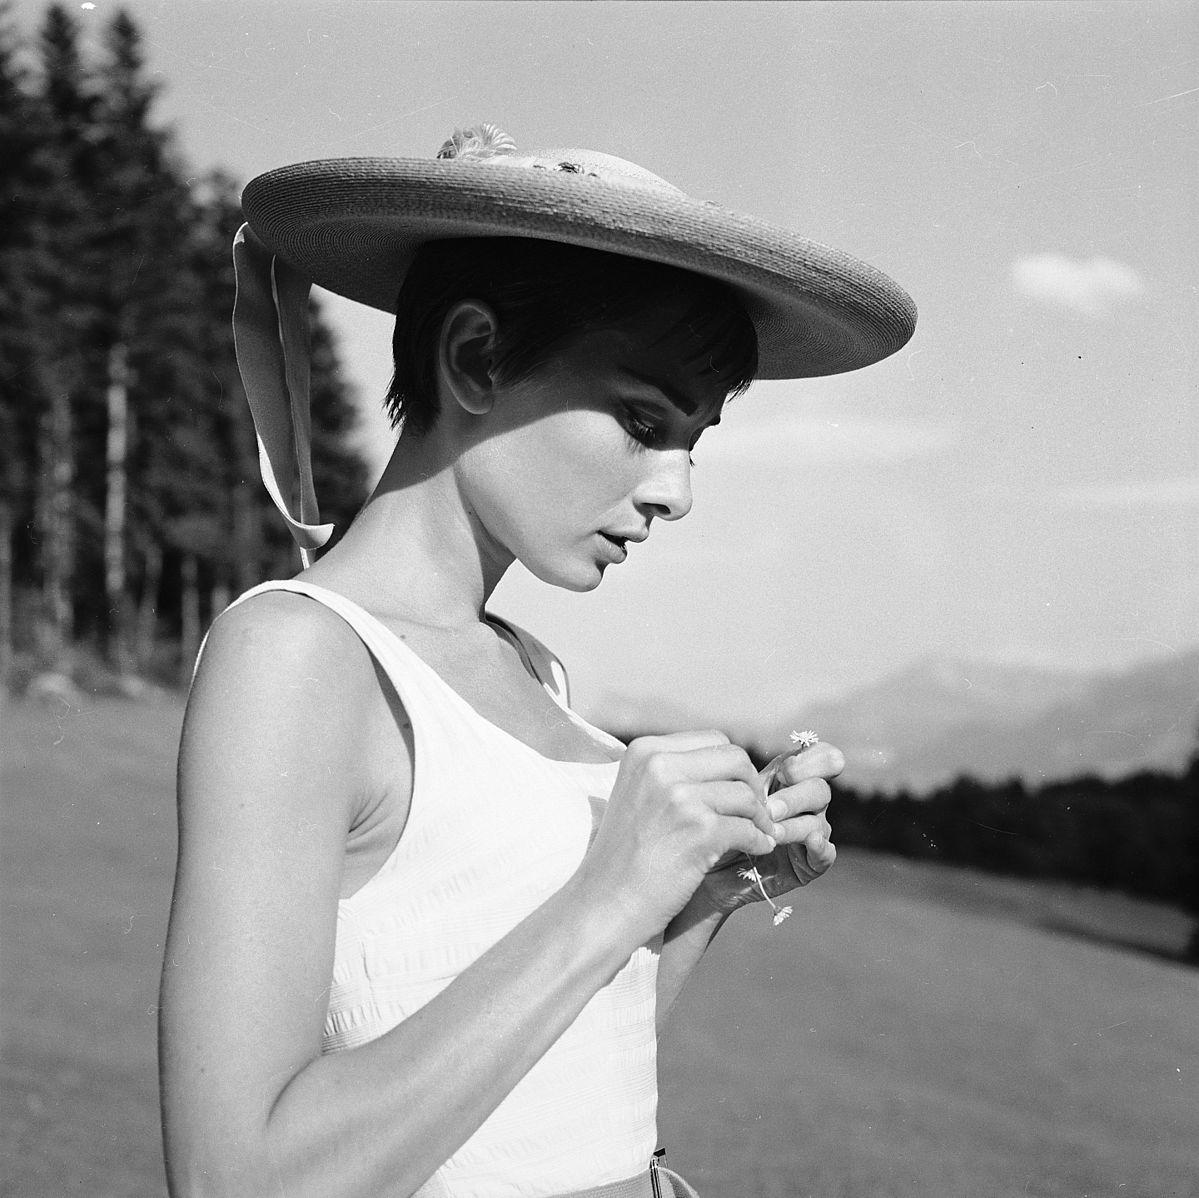 Audrey_Hepburn_auf_dem_Bürgenstock_(10).jpg